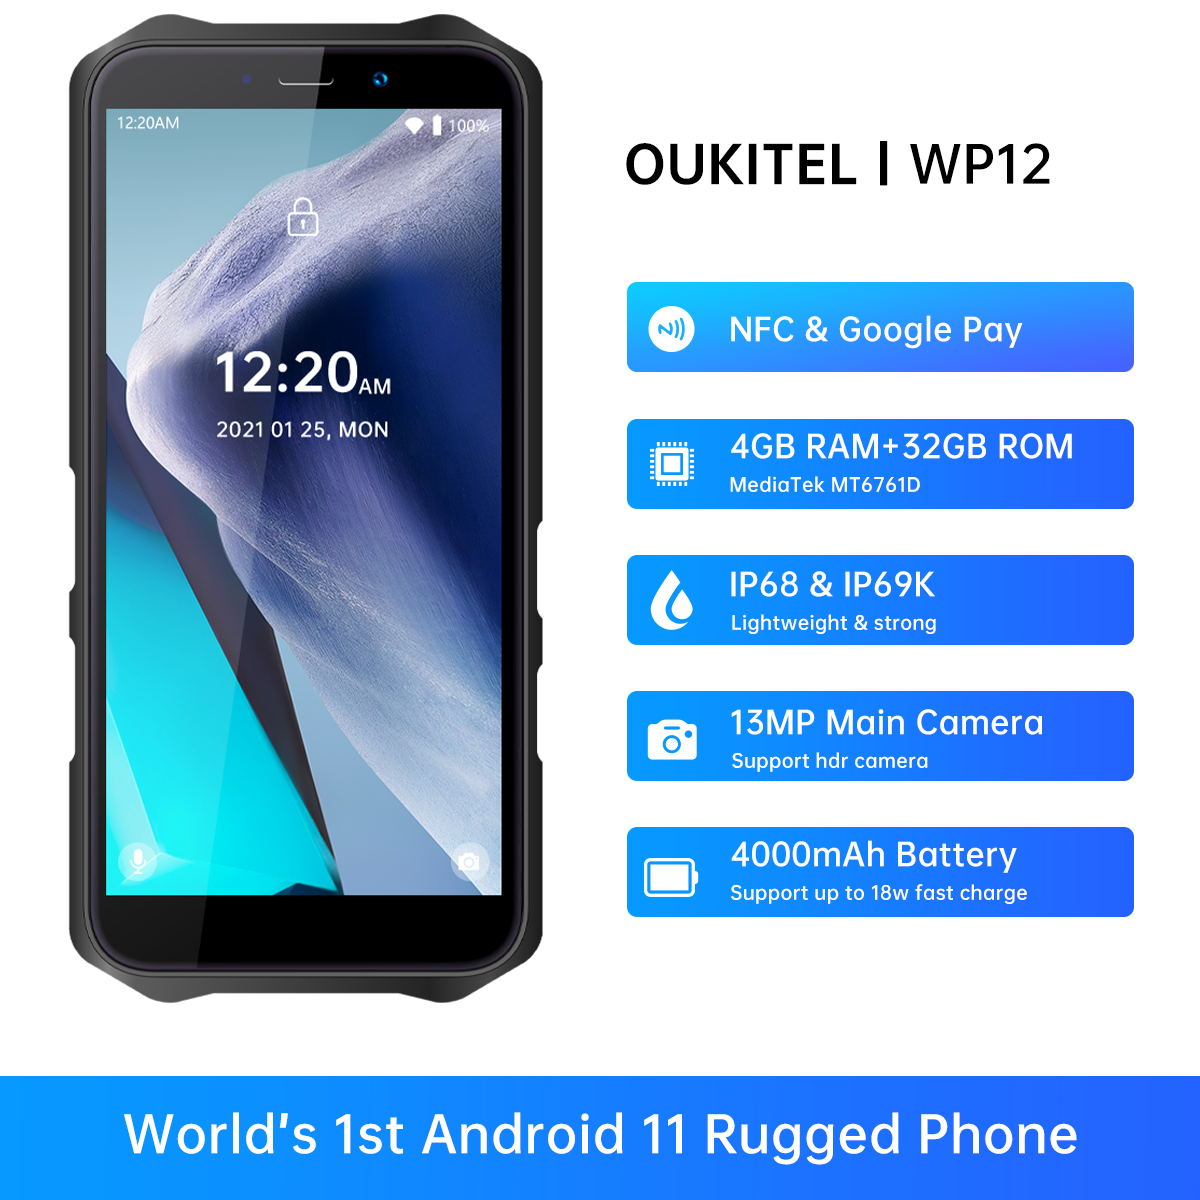 Смартфон Oukitel WP12 защищенный, NFC, Android 11, 4 + 32 ГБ, 4000 мАч, 5,5 дюйма, 13 МП, IP68/69K